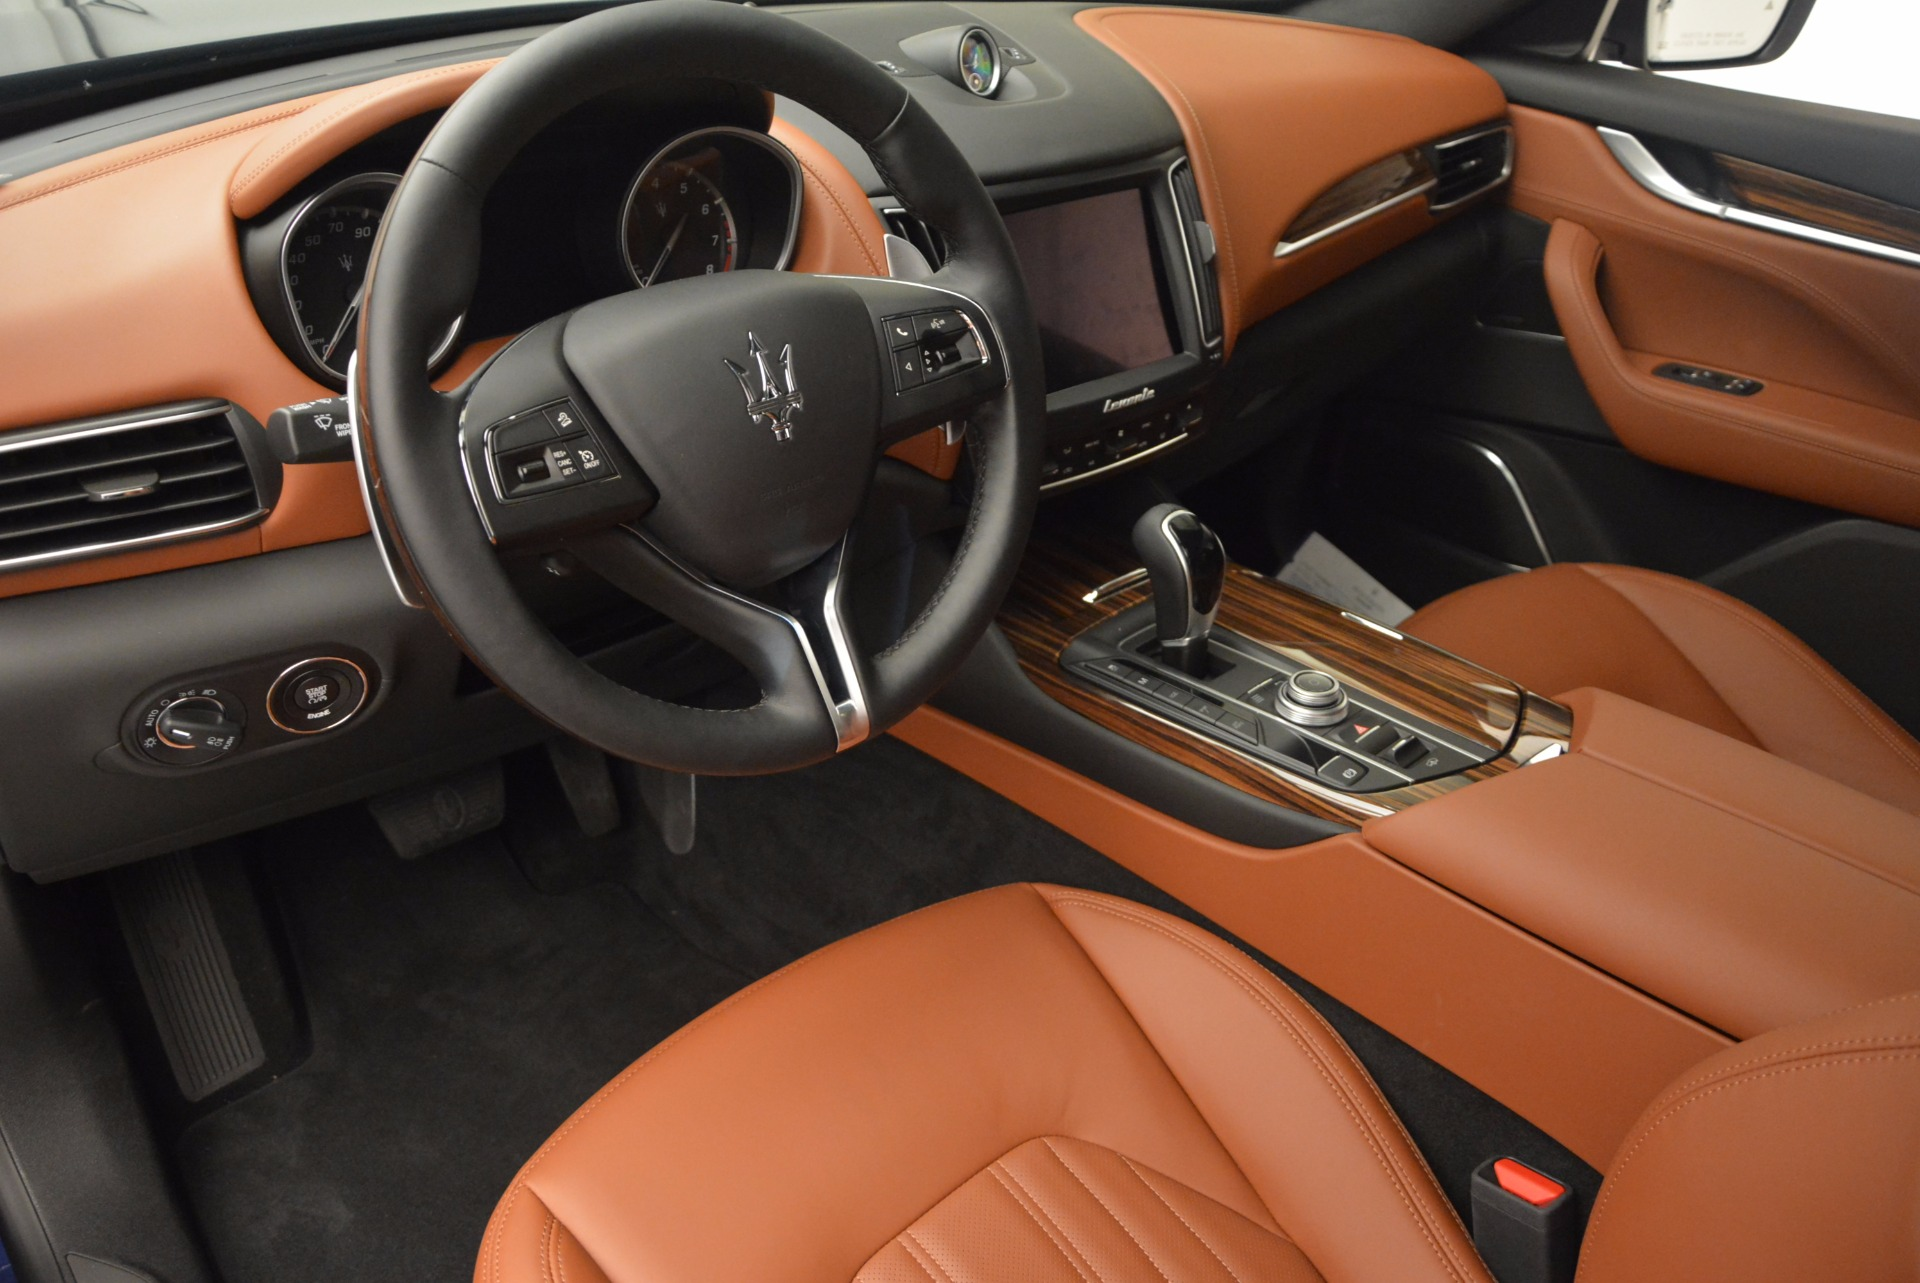 Used 2017 Maserati Levante S For Sale In Westport, CT 752_p19